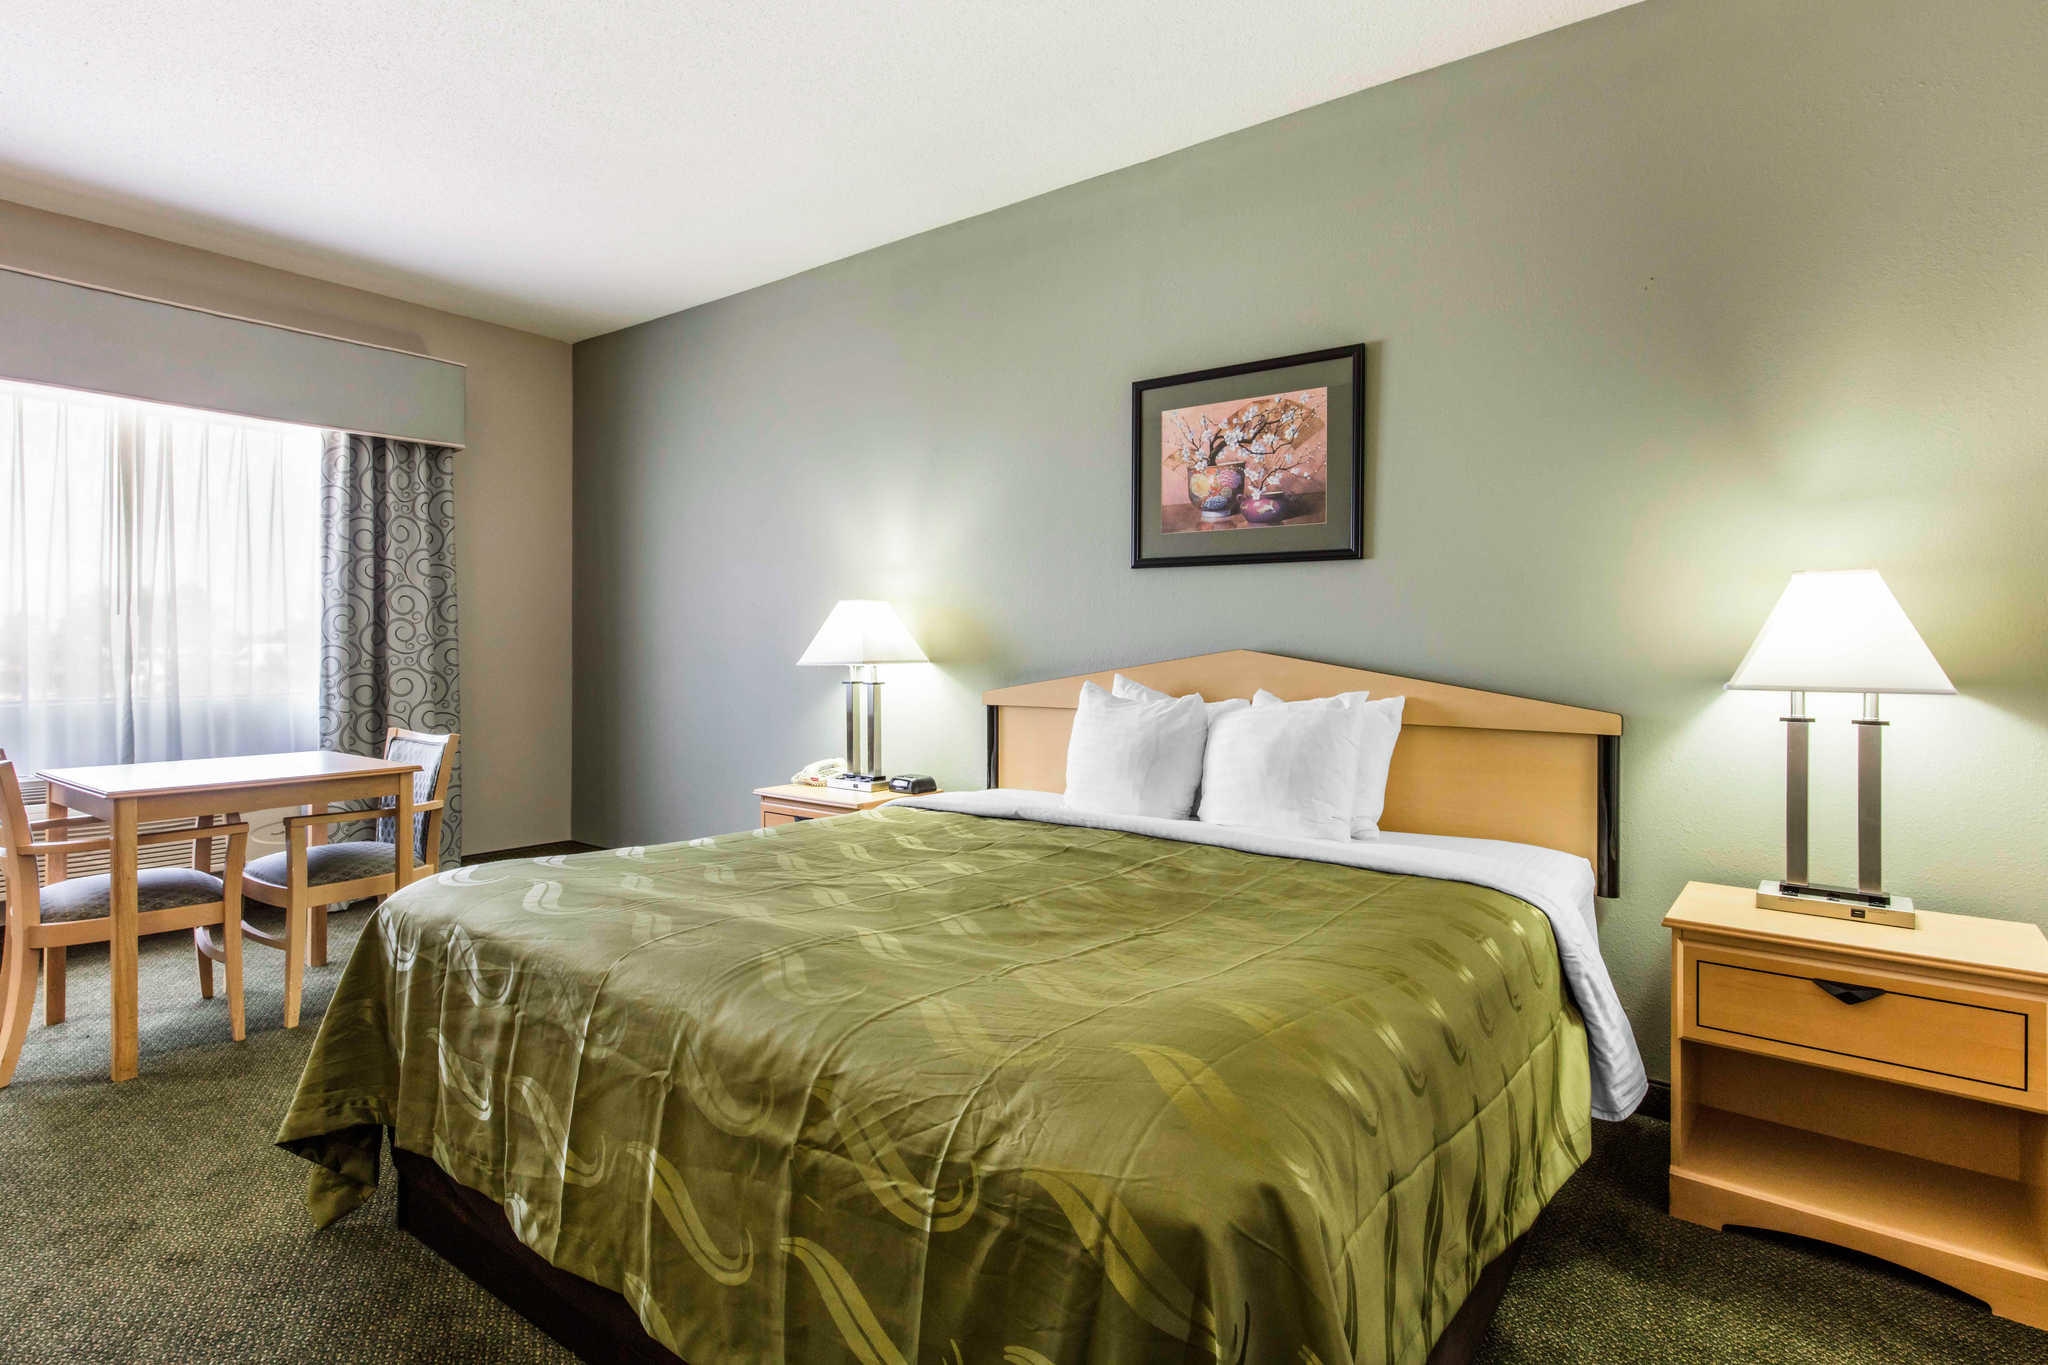 Quality Inn & Suites Jackson Int'l Airport image 10